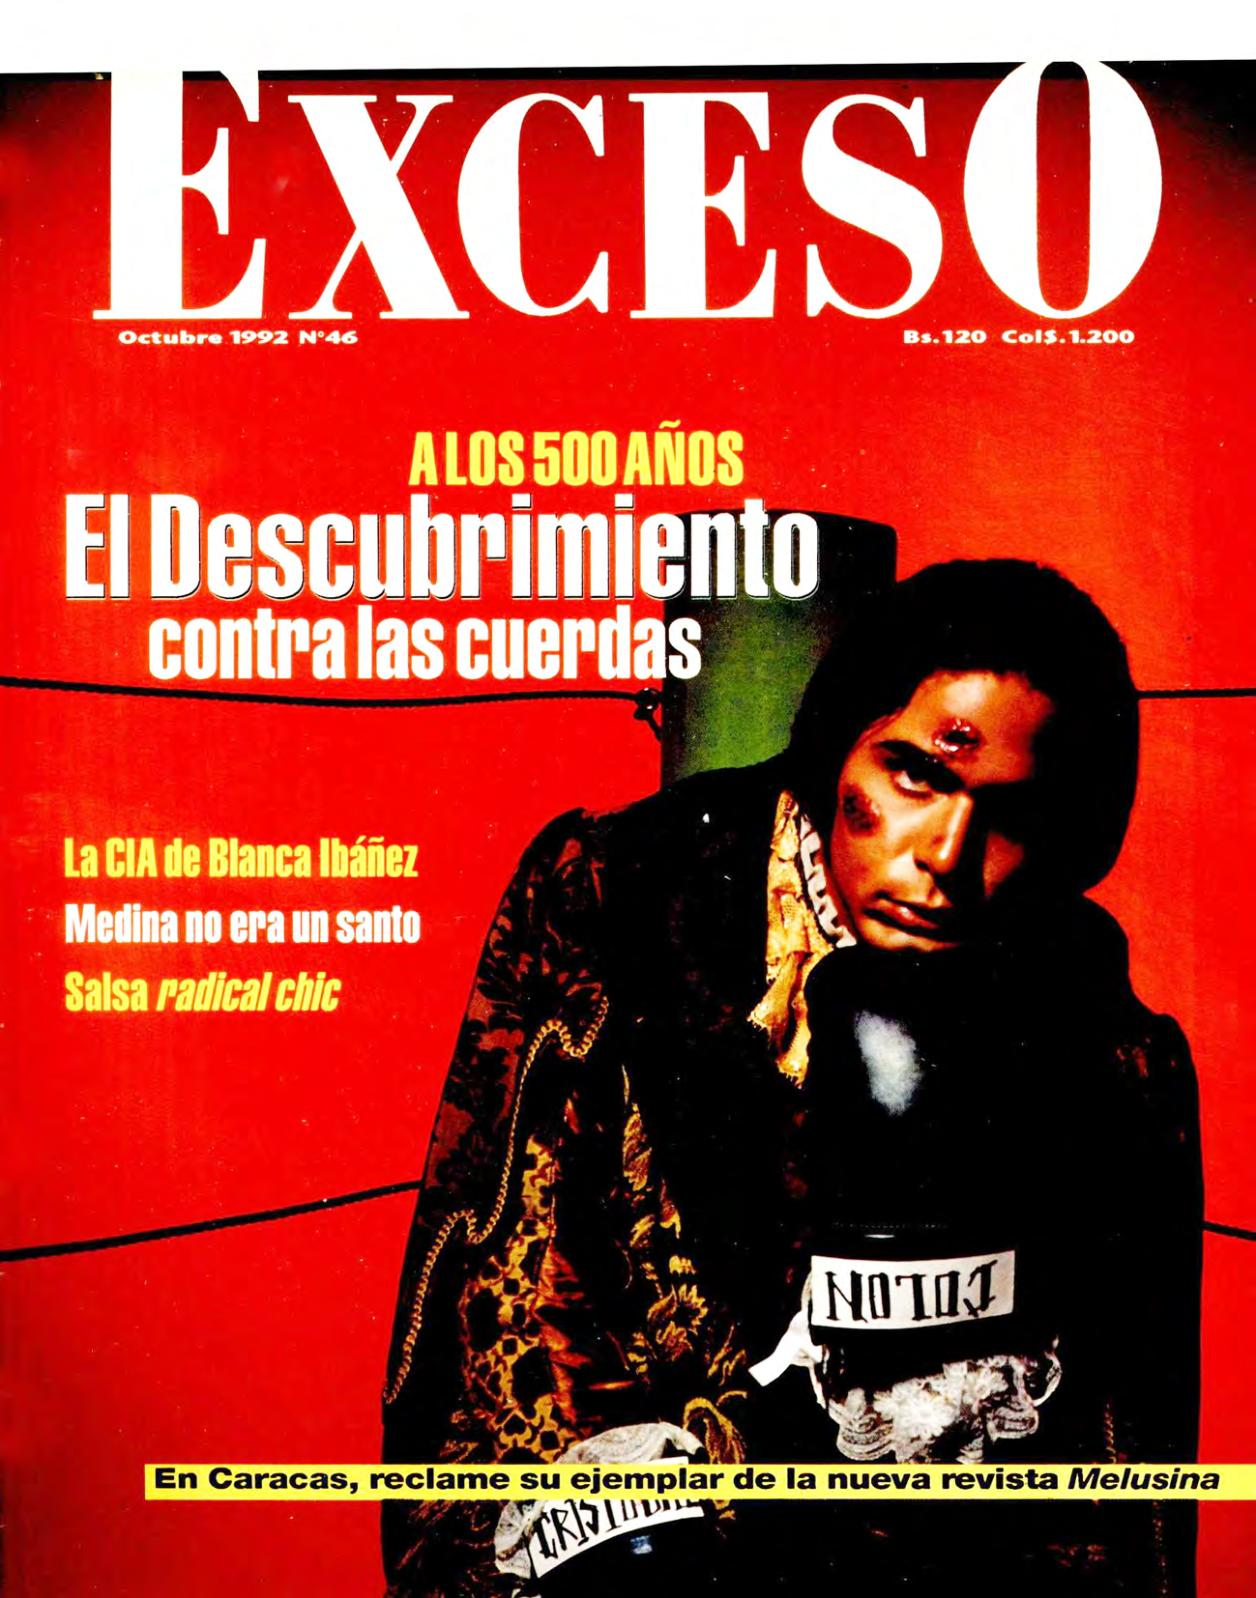 Revista Octubre Calaméo Exceso Nº 1992 46 Edicion UgwBwnq8